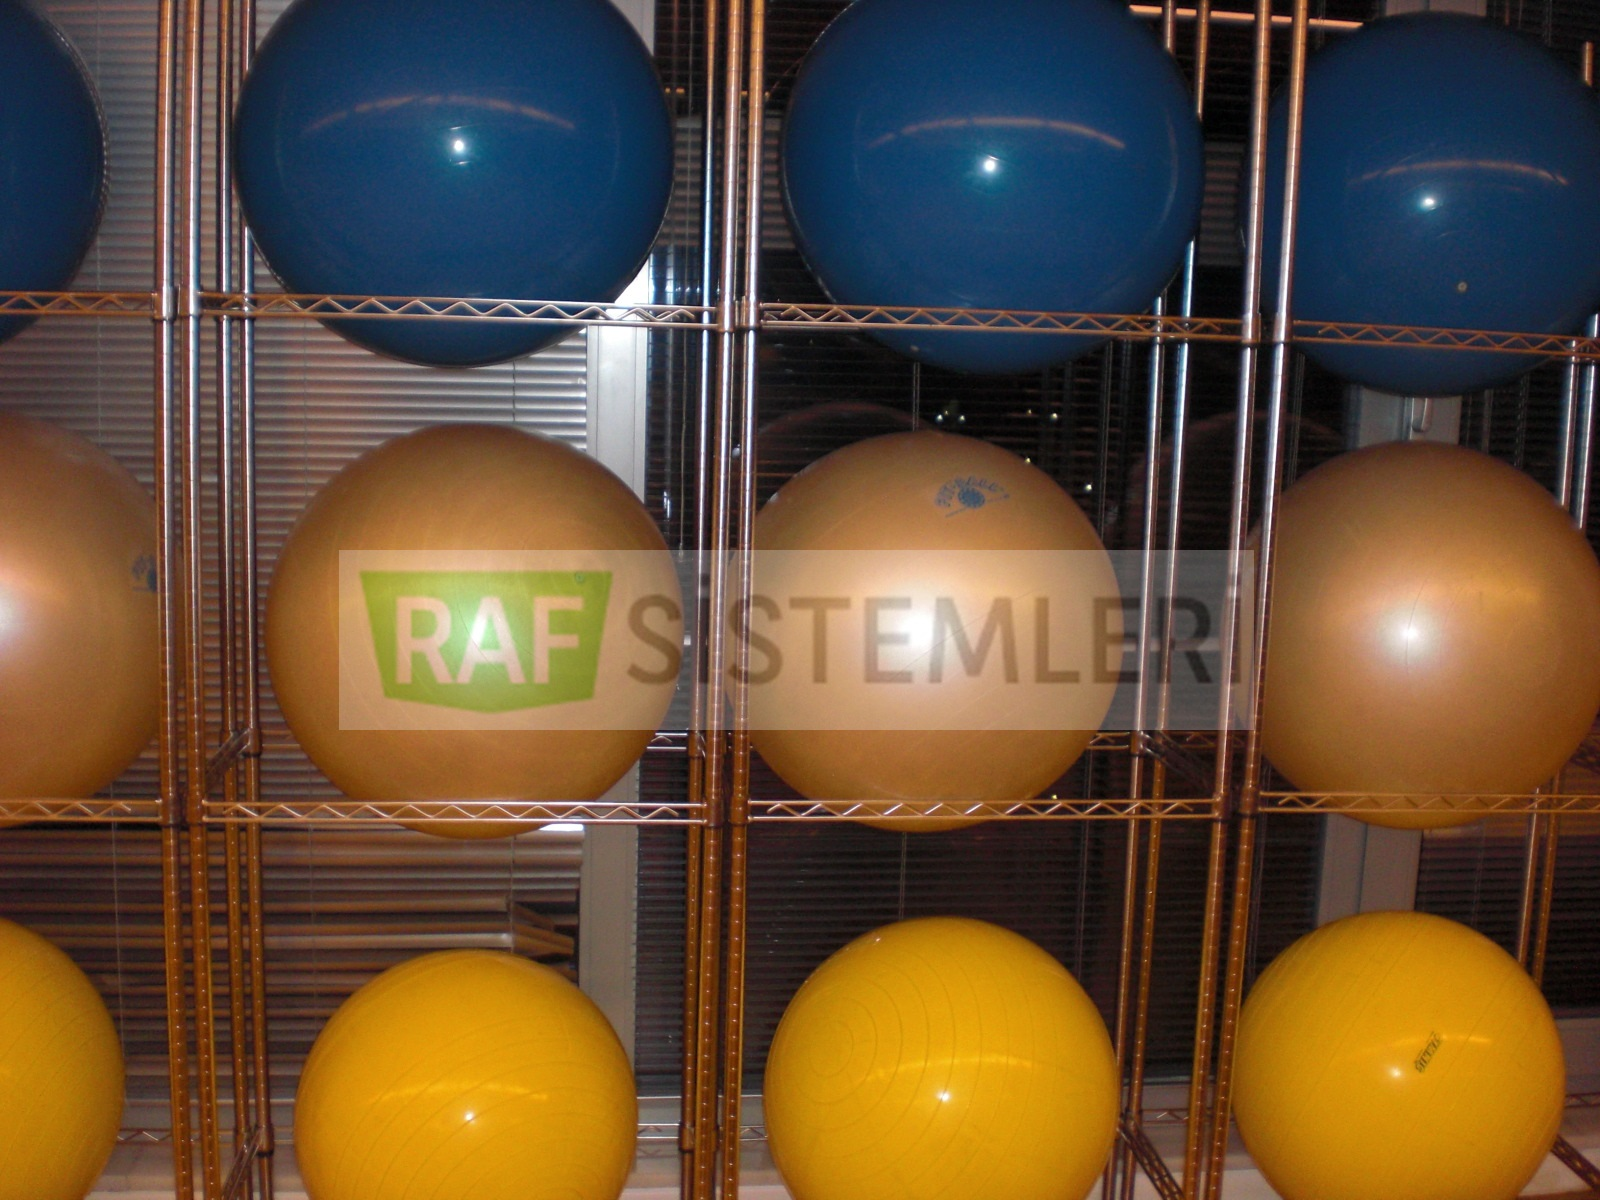 Plates Toplari Raf Sistemleri